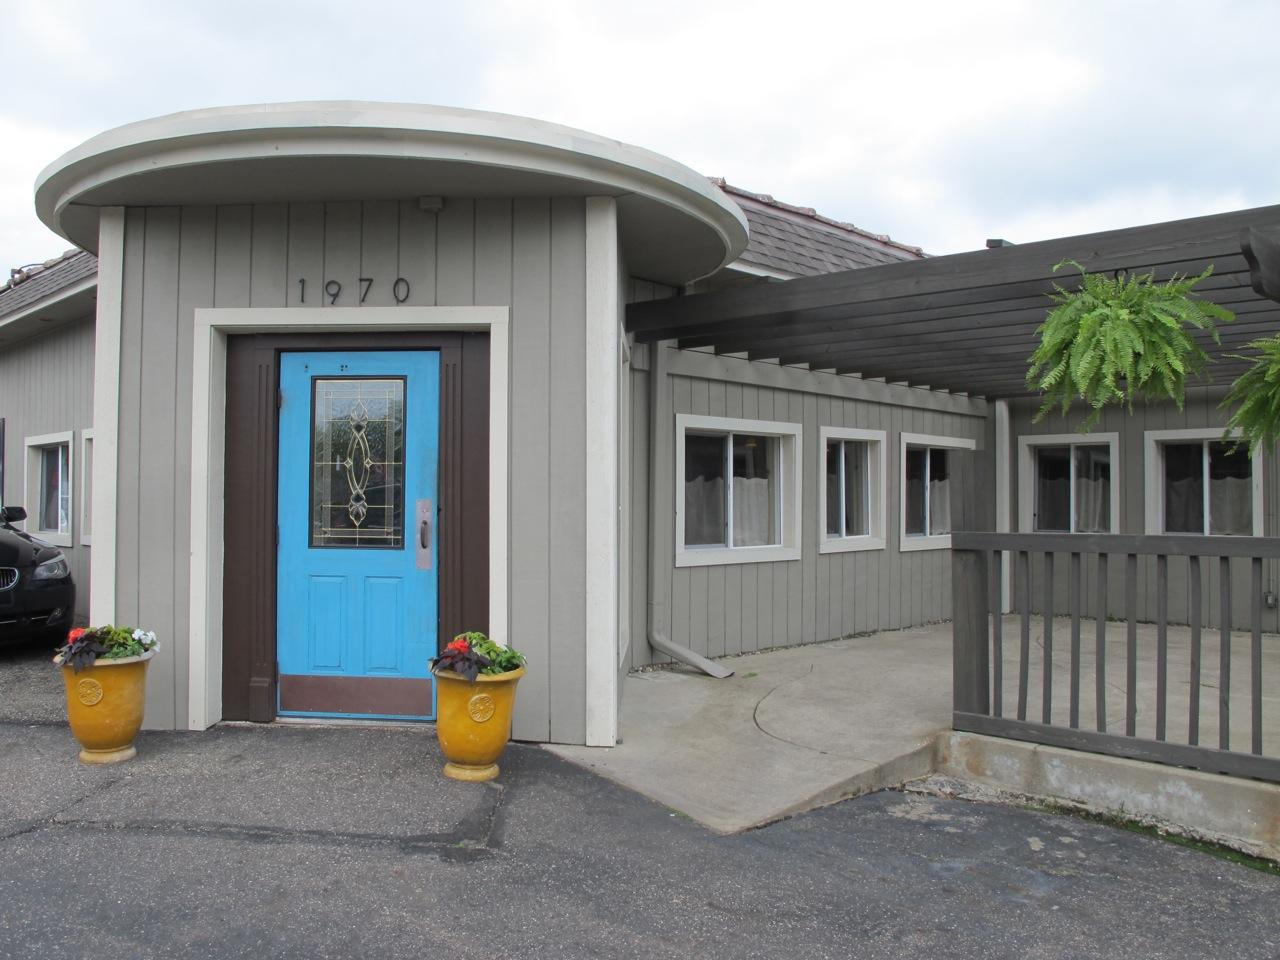 & The Blue Door Cafe u0026 Bakery   Cuyahoga Falls OH